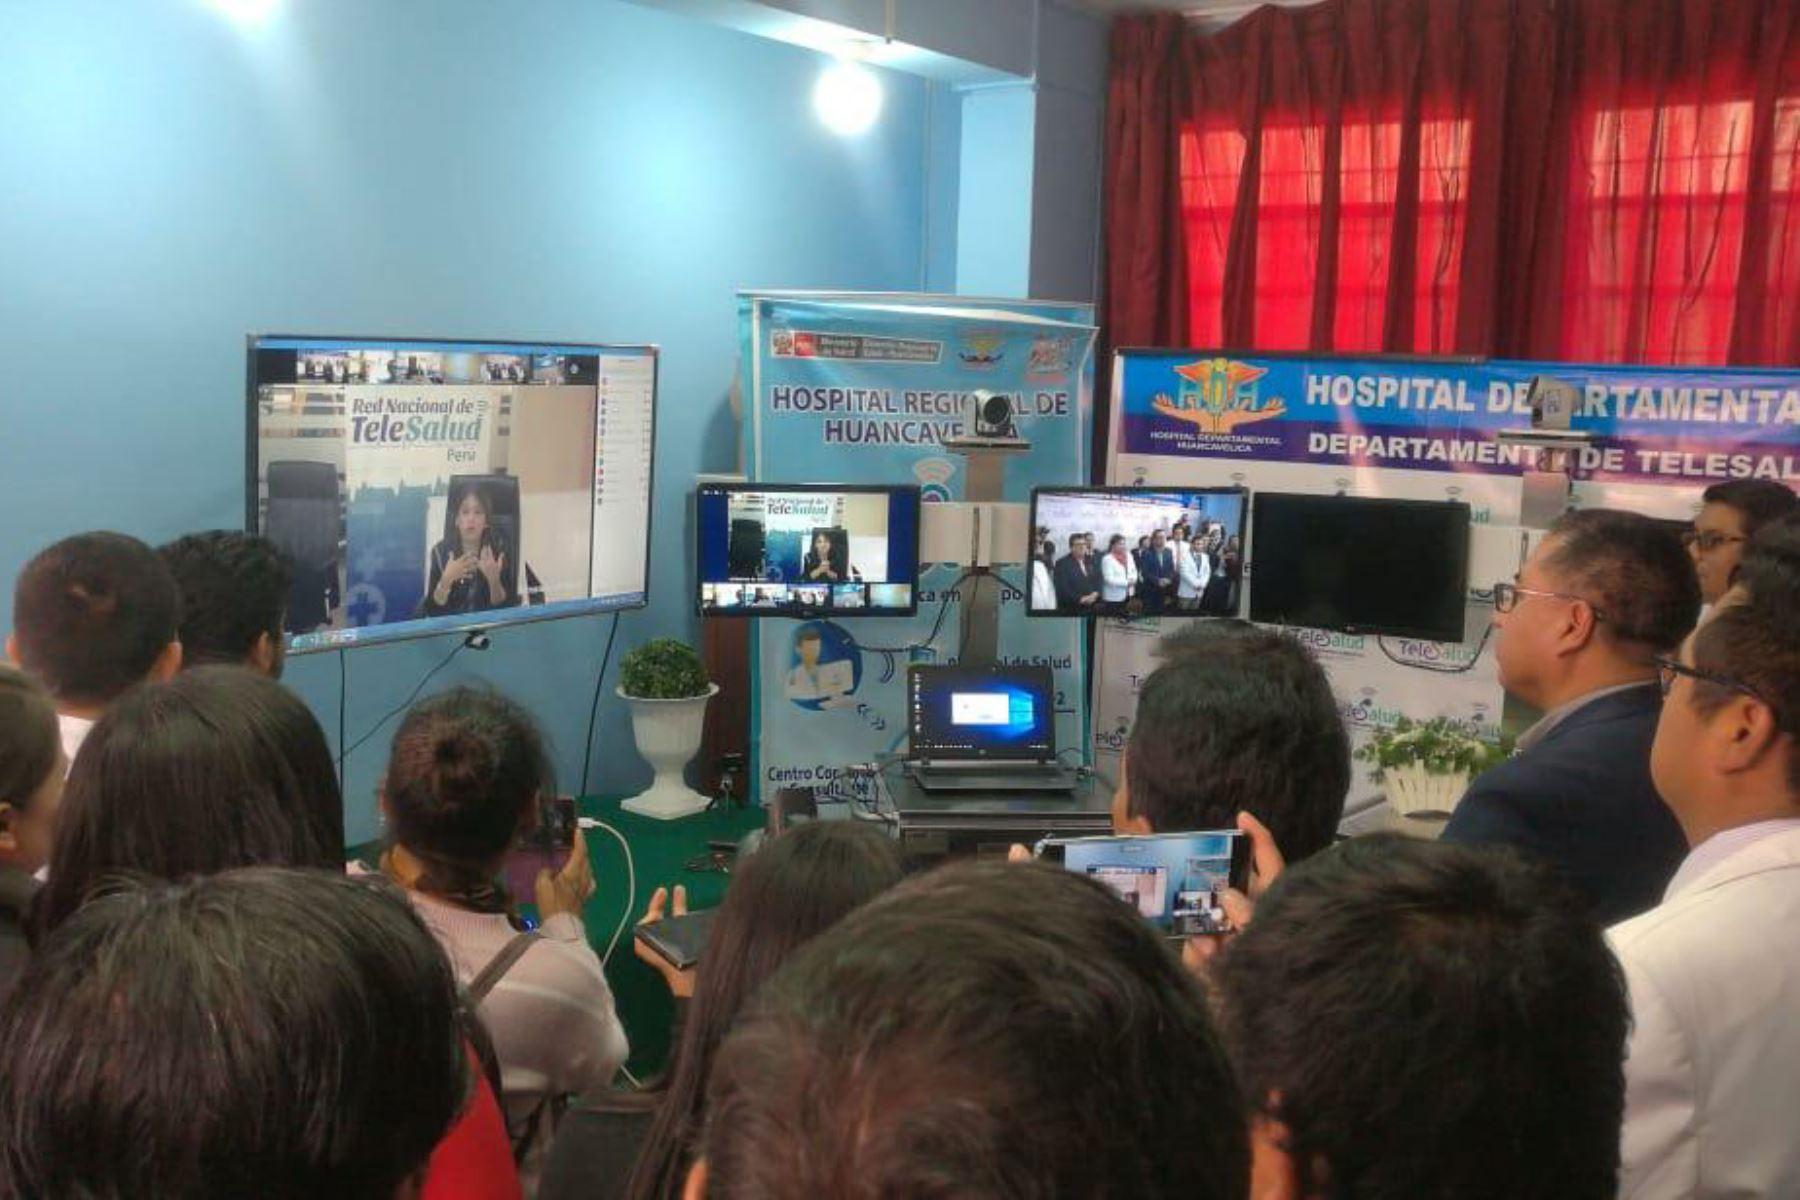 Implementan teleconferencias para prevenir enfermedades por bajas temperaturas. ANDINA/Difusión